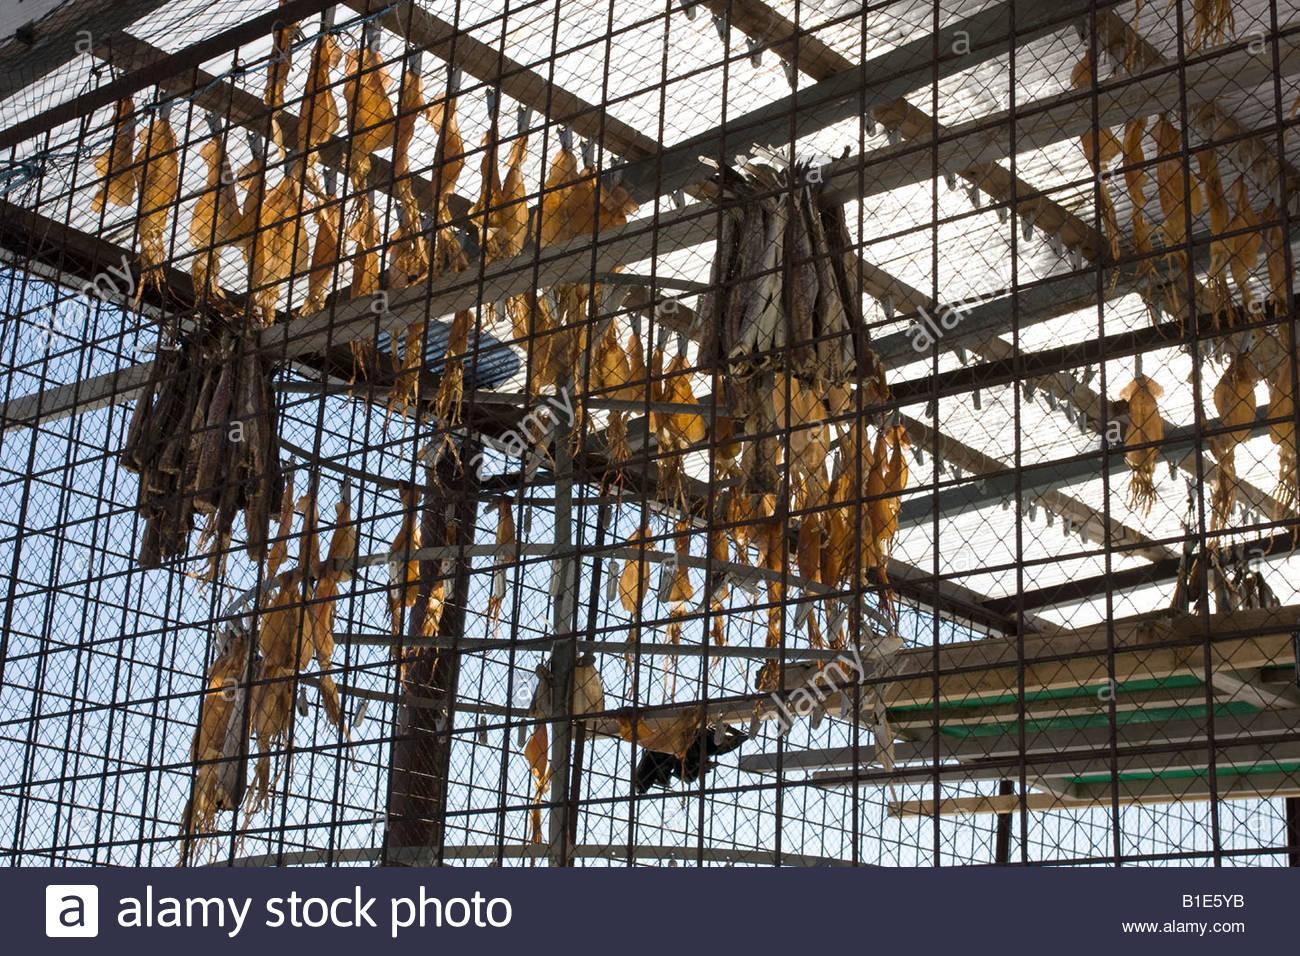 Wire Fish Stockfotos & Wire Fish Bilder - Alamy